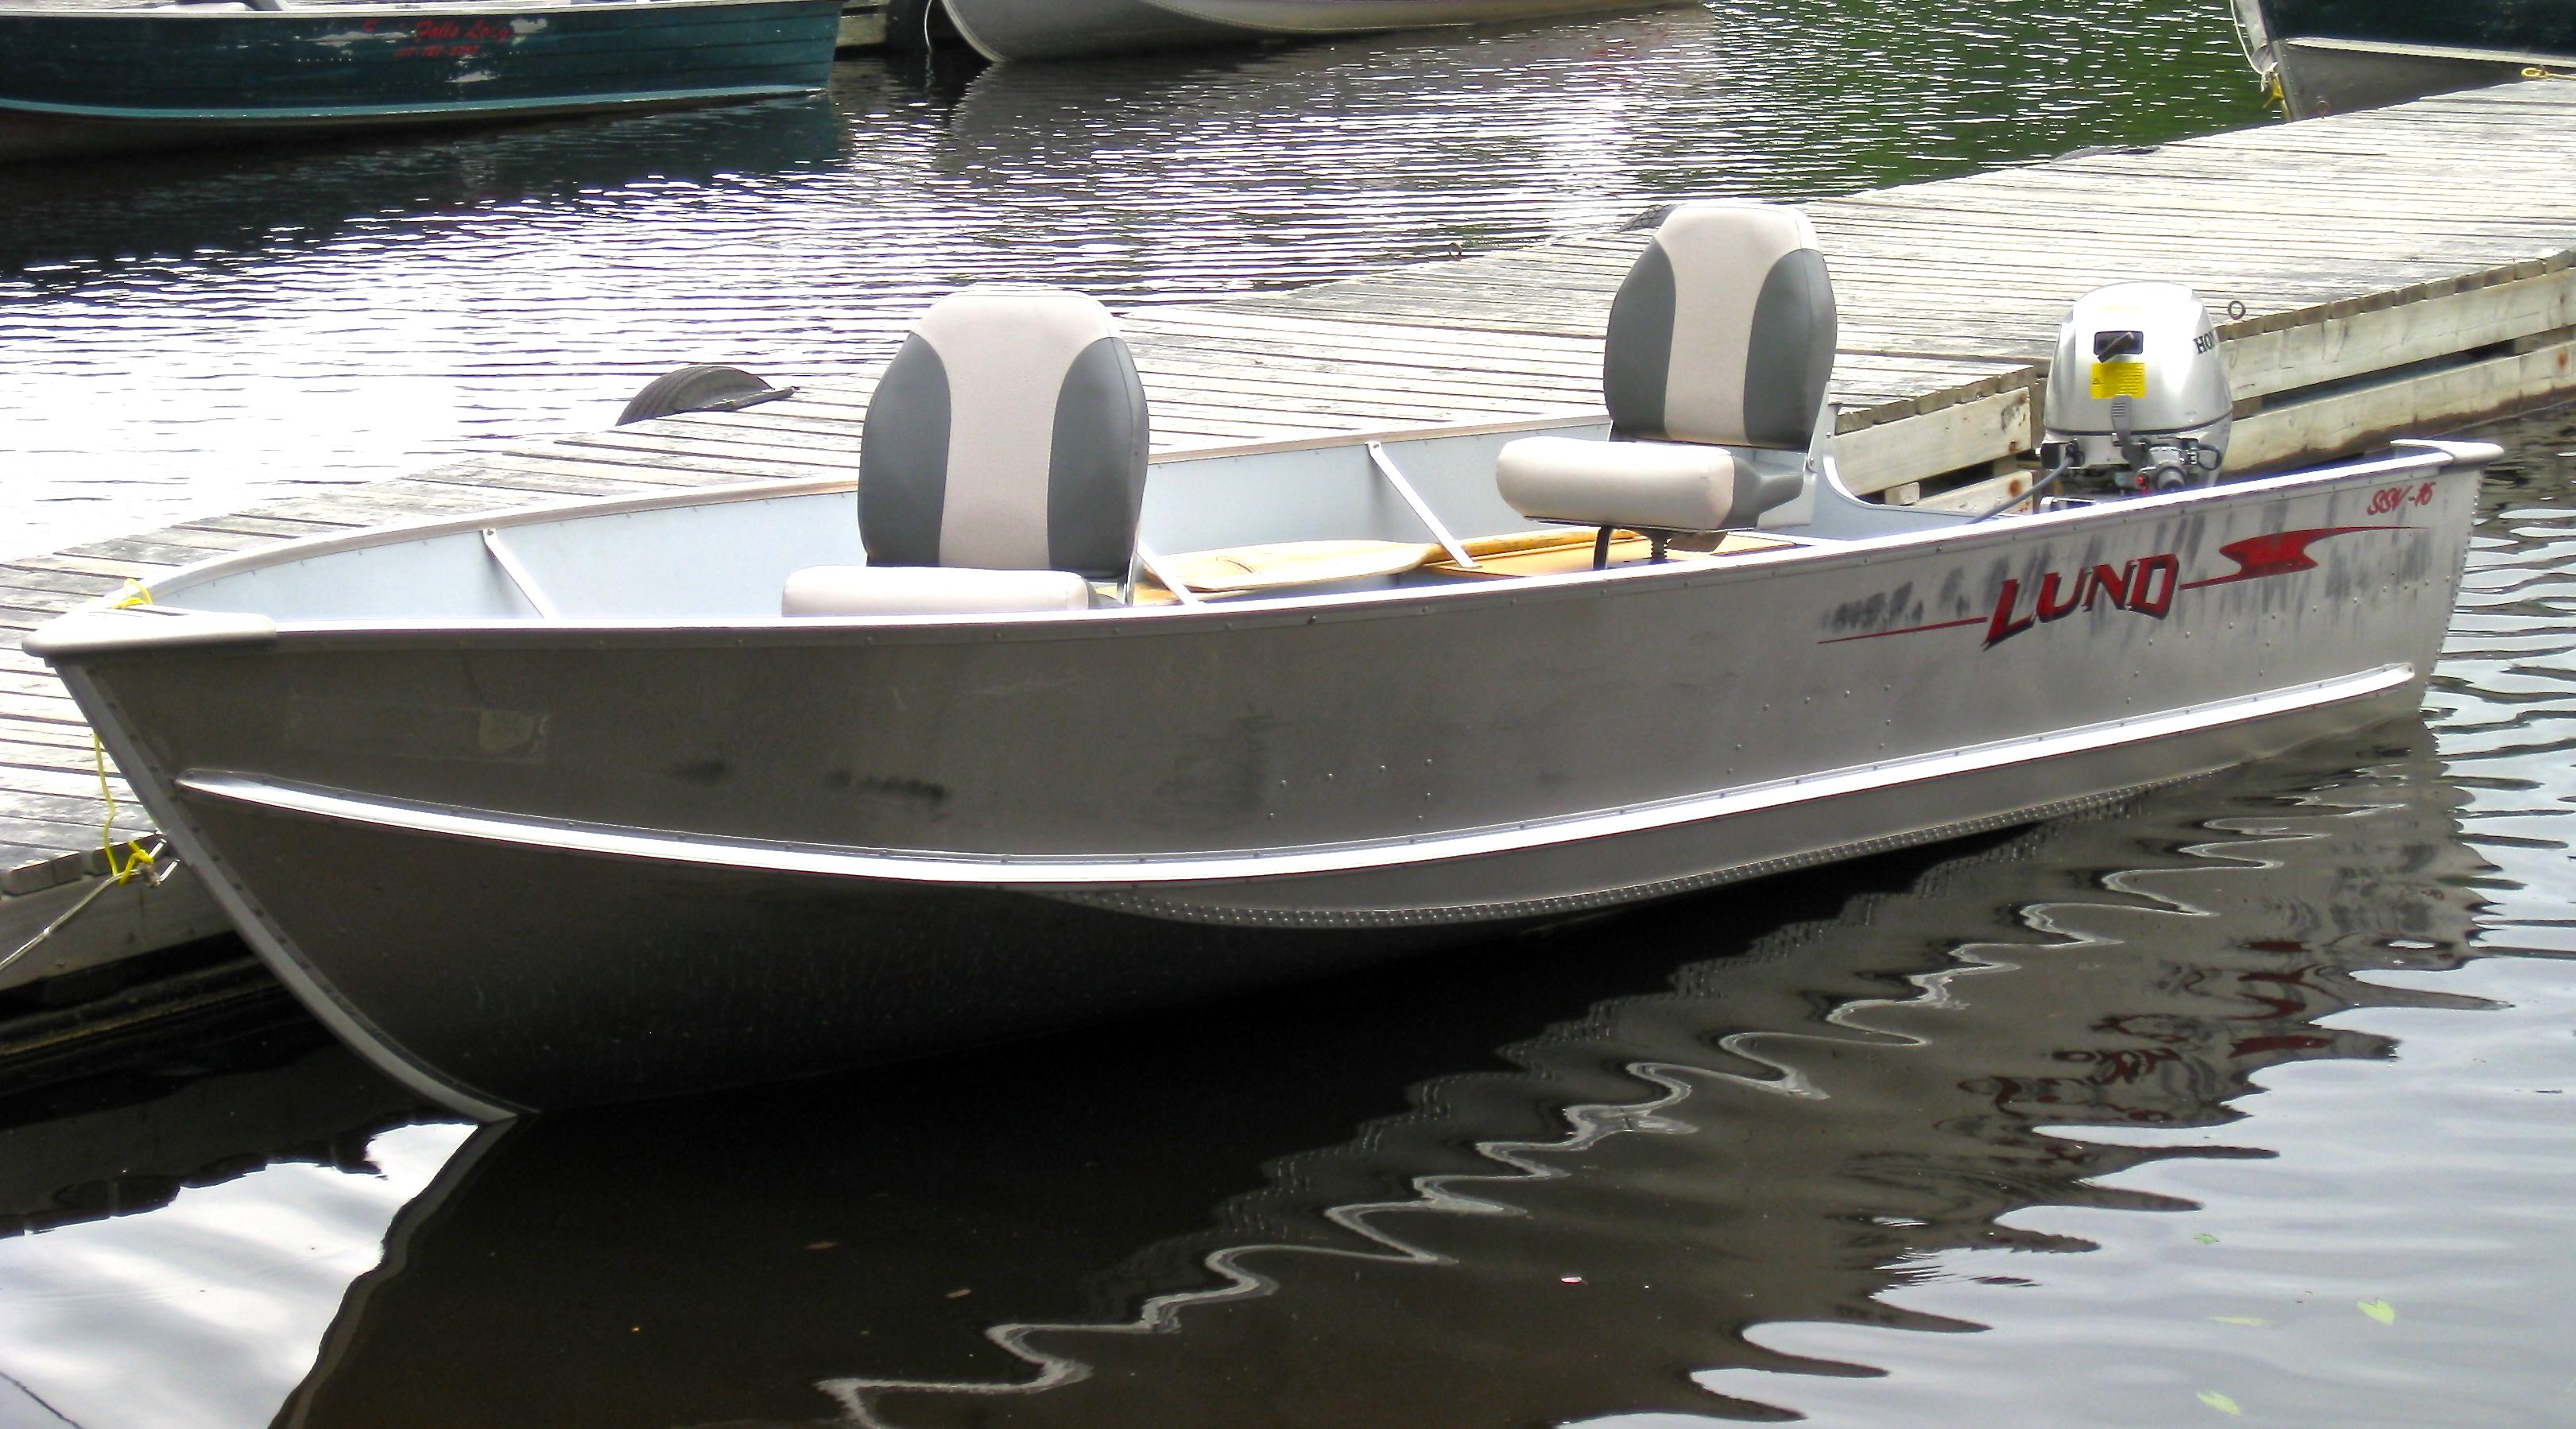 New boat #2